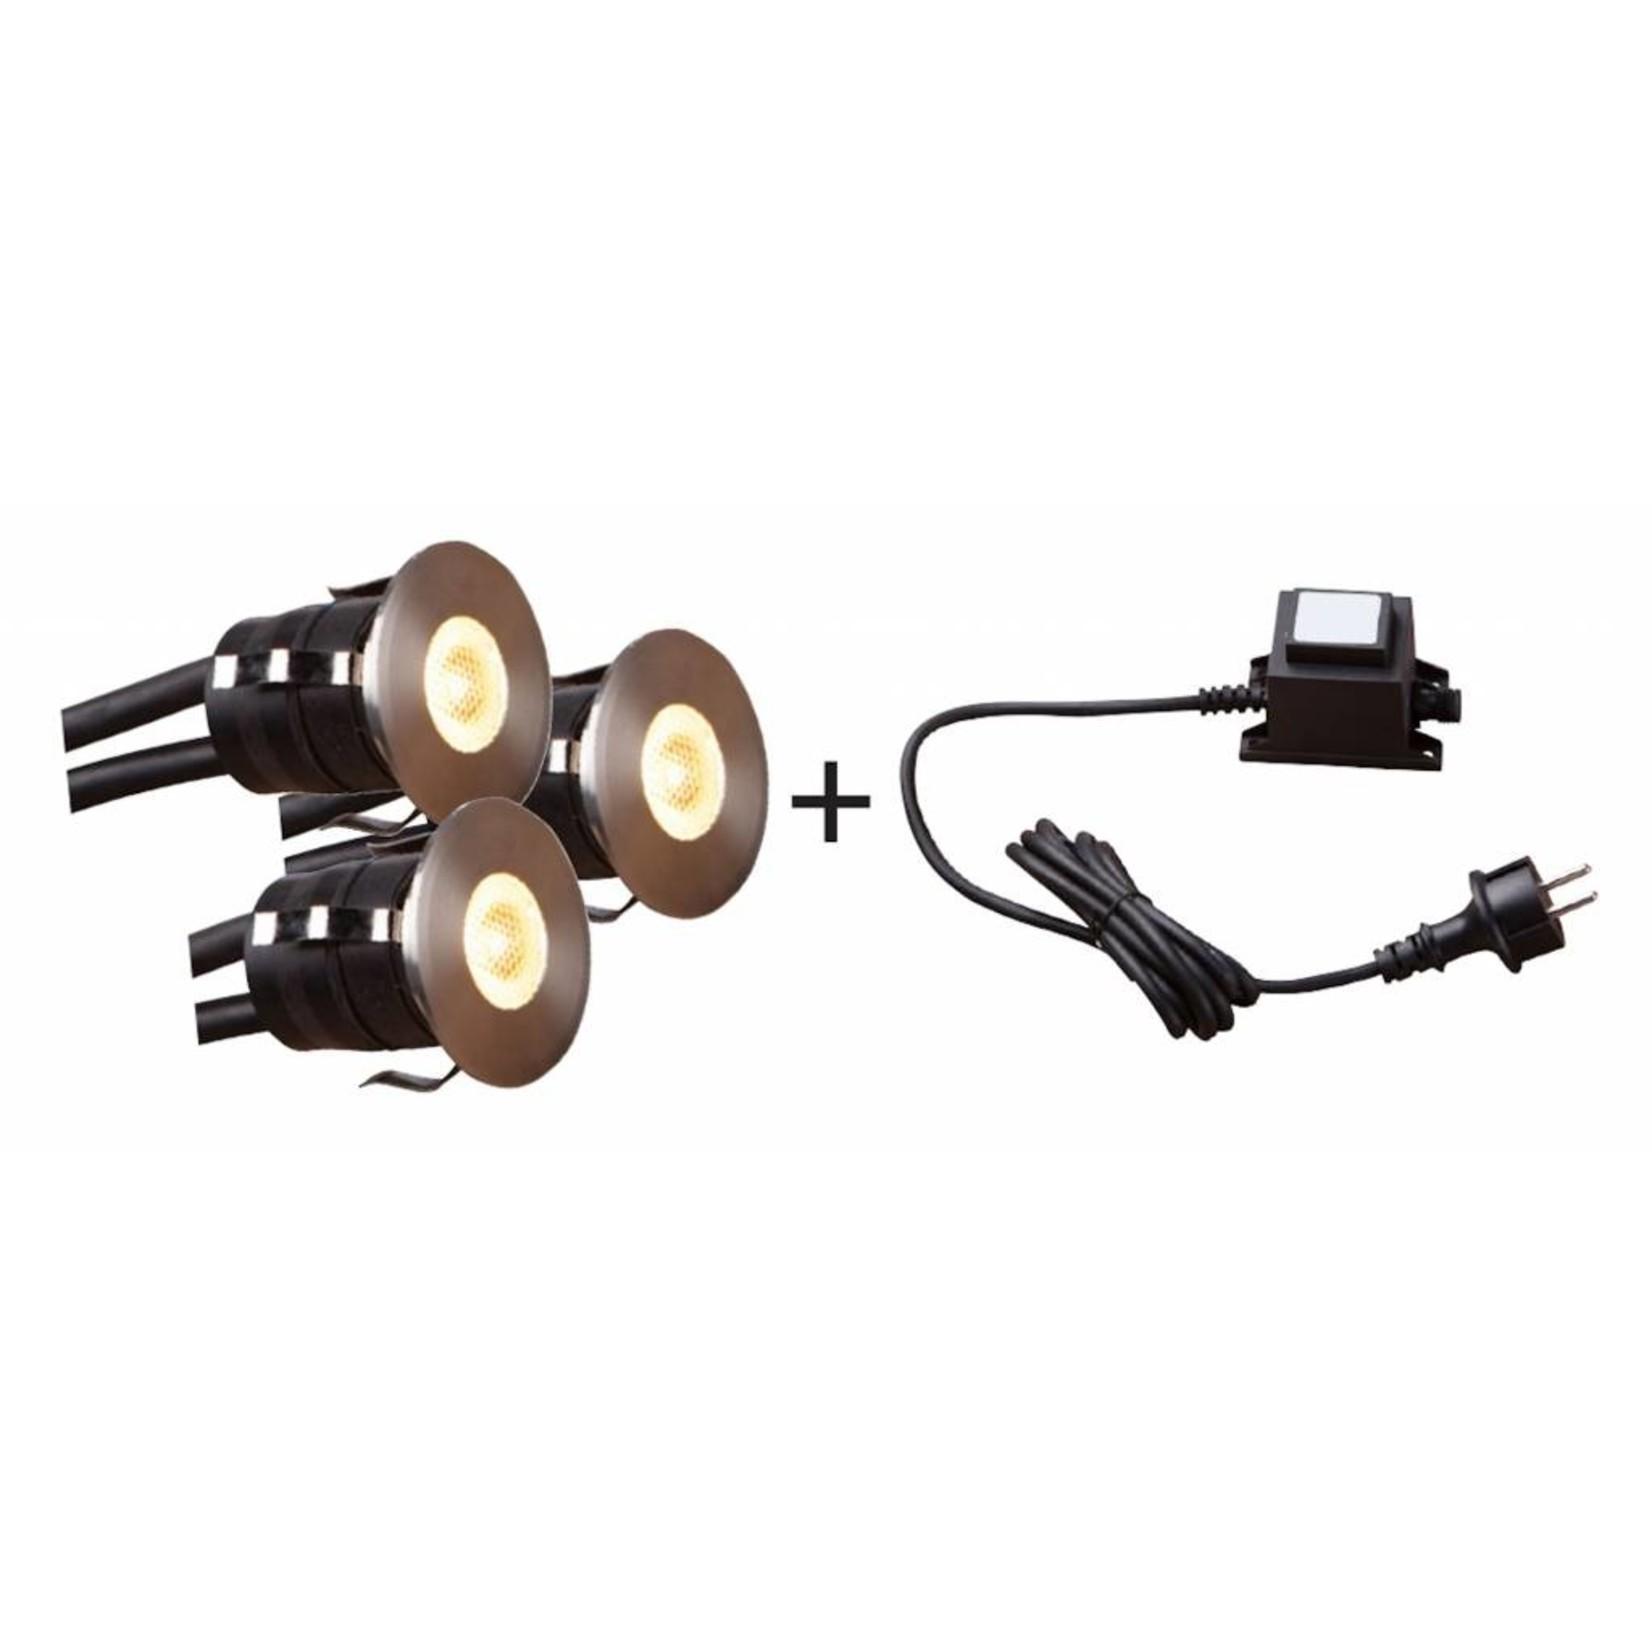 Heissner Smart Light starterset vlonderverlichting